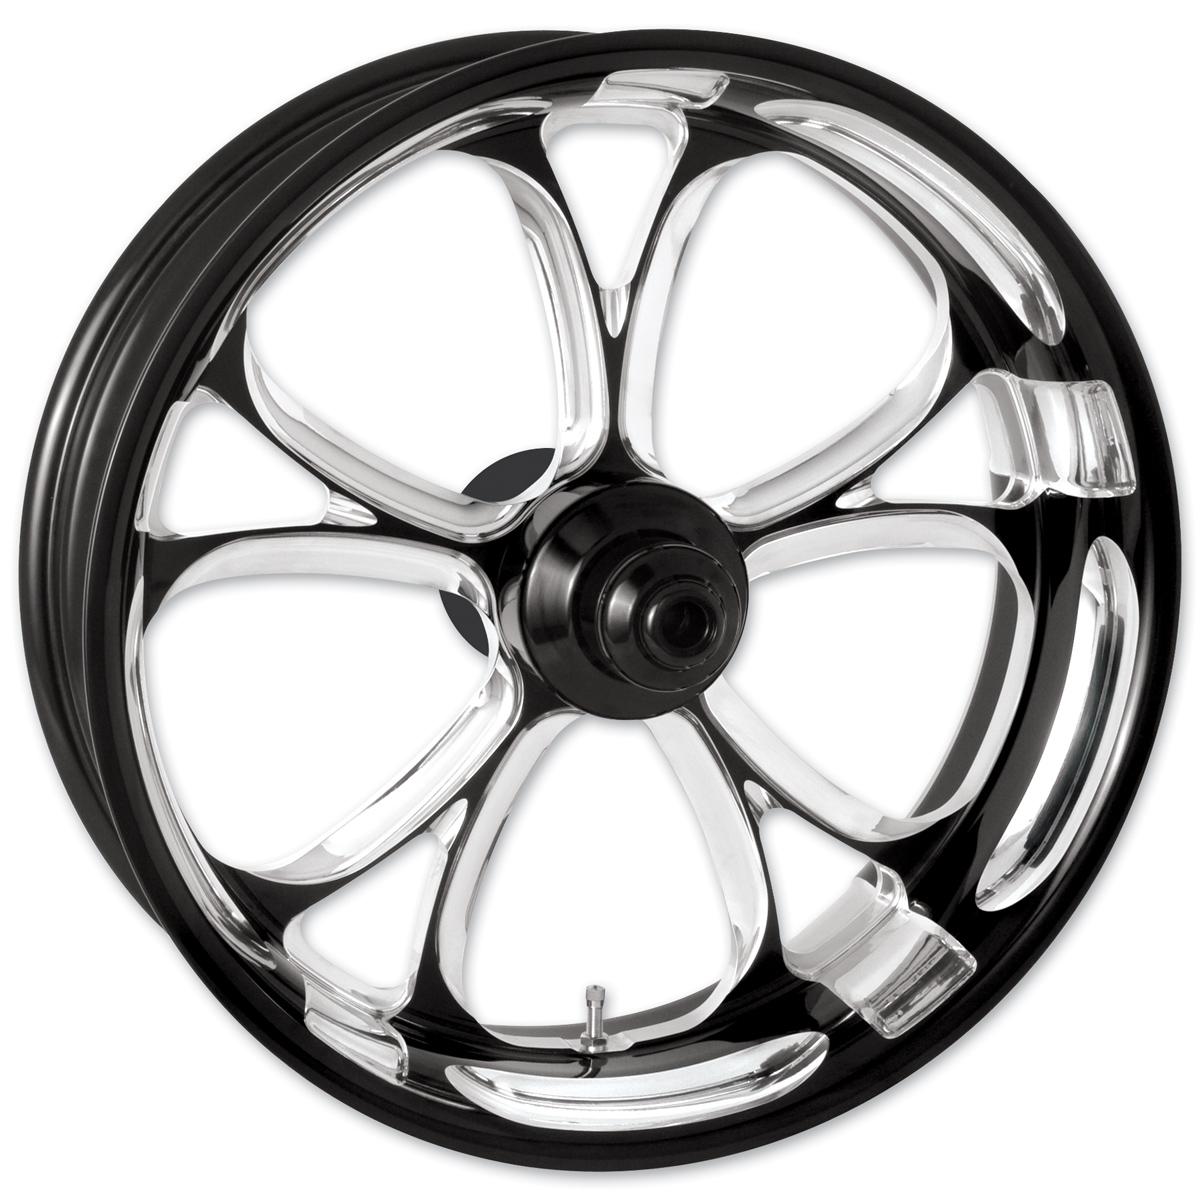 Performance Machine Luxe Platinum Cut Front Wheel 21x3.5 Dual disc